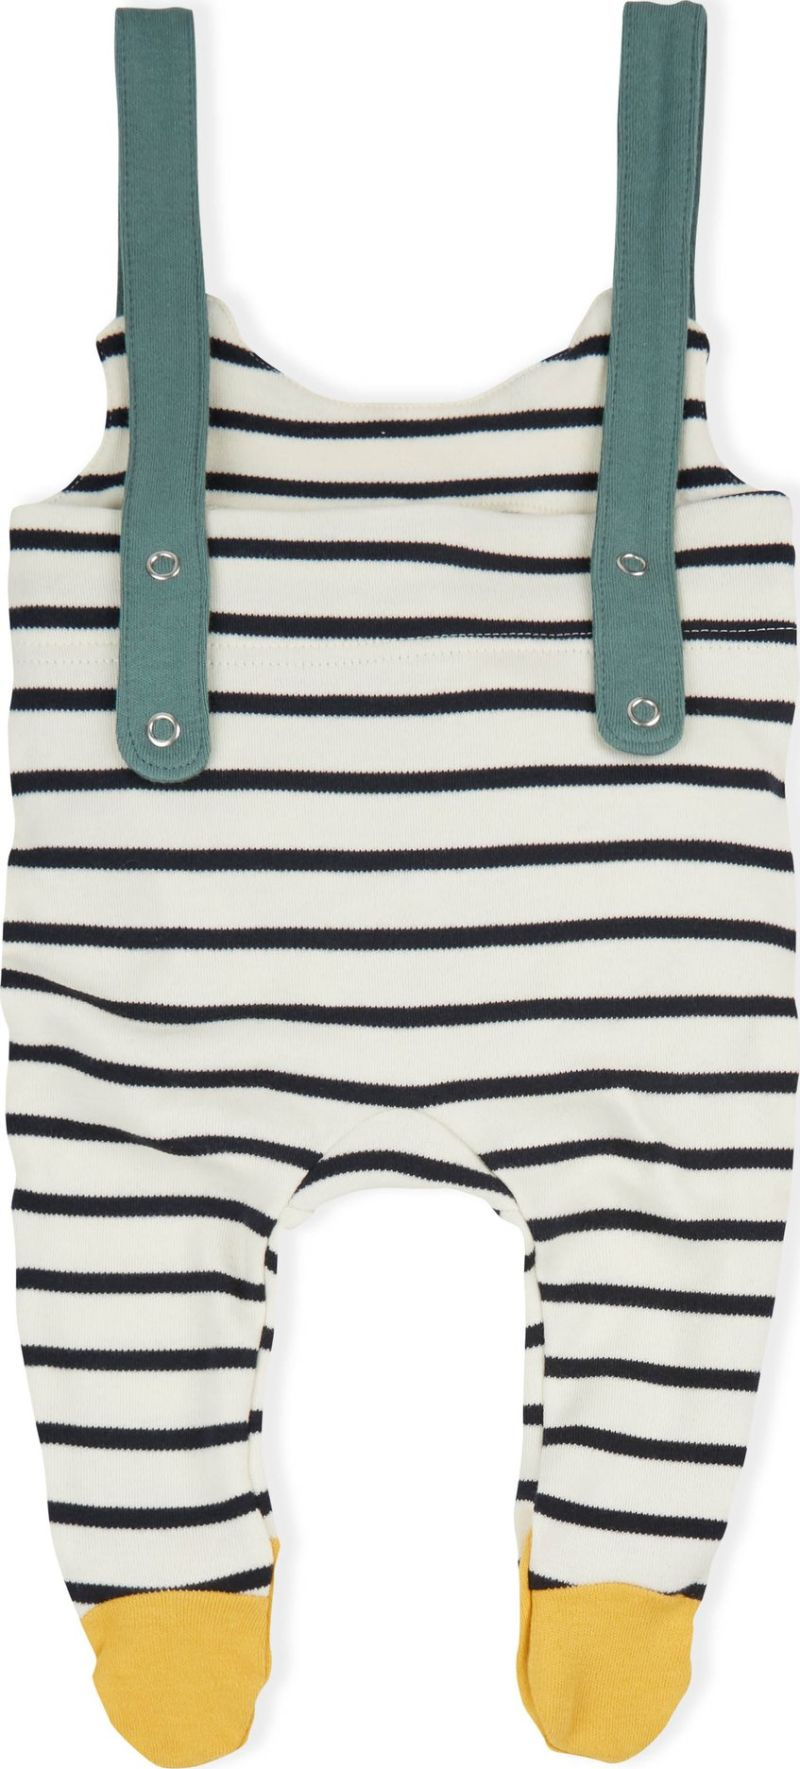 Salopette Breton Stripes